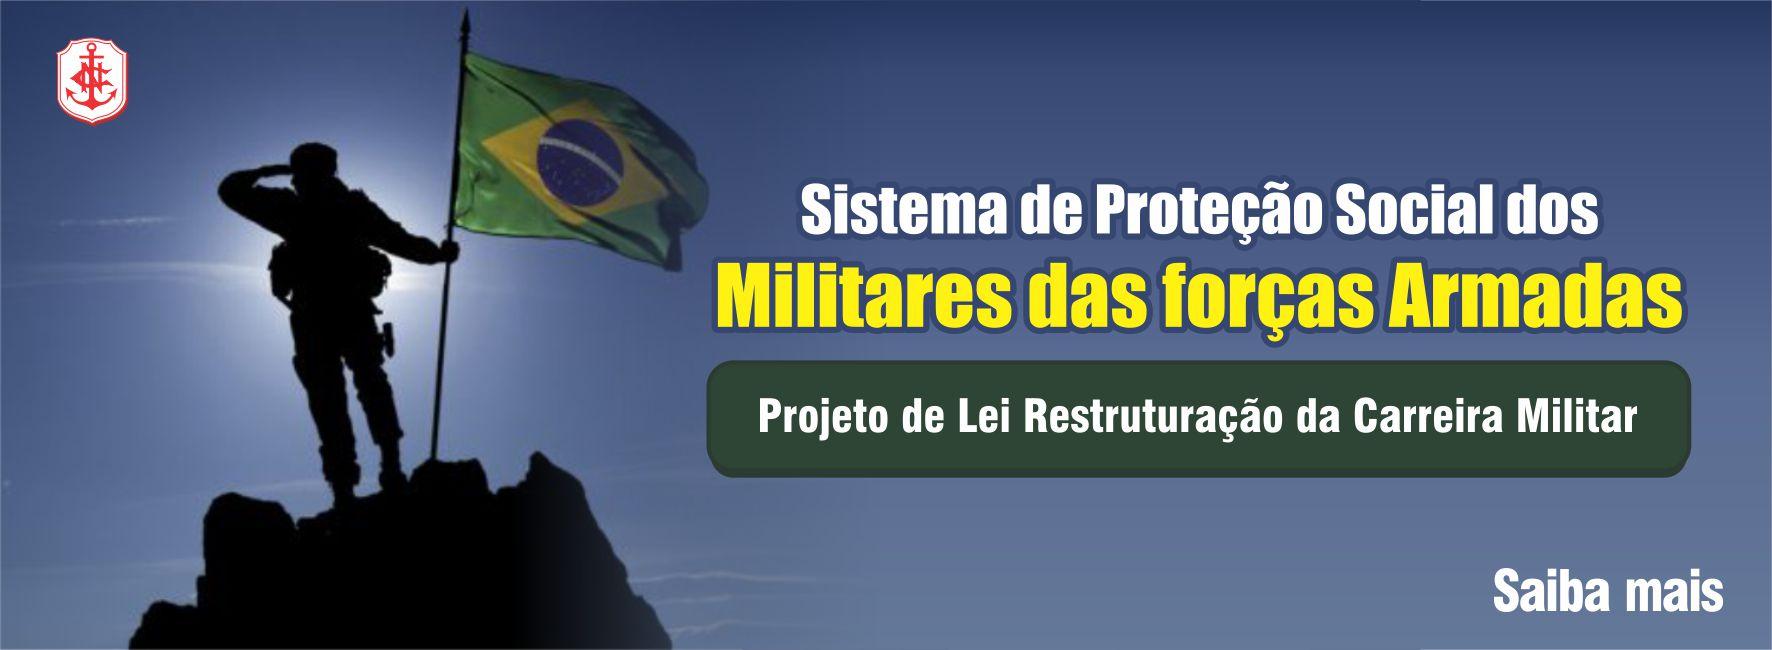 https://www.clubenaval.org.br/novo/sistema-de-prote%C3%A7%C3%A3o-social-dos-militares-das-for%C3%A7as-armadas